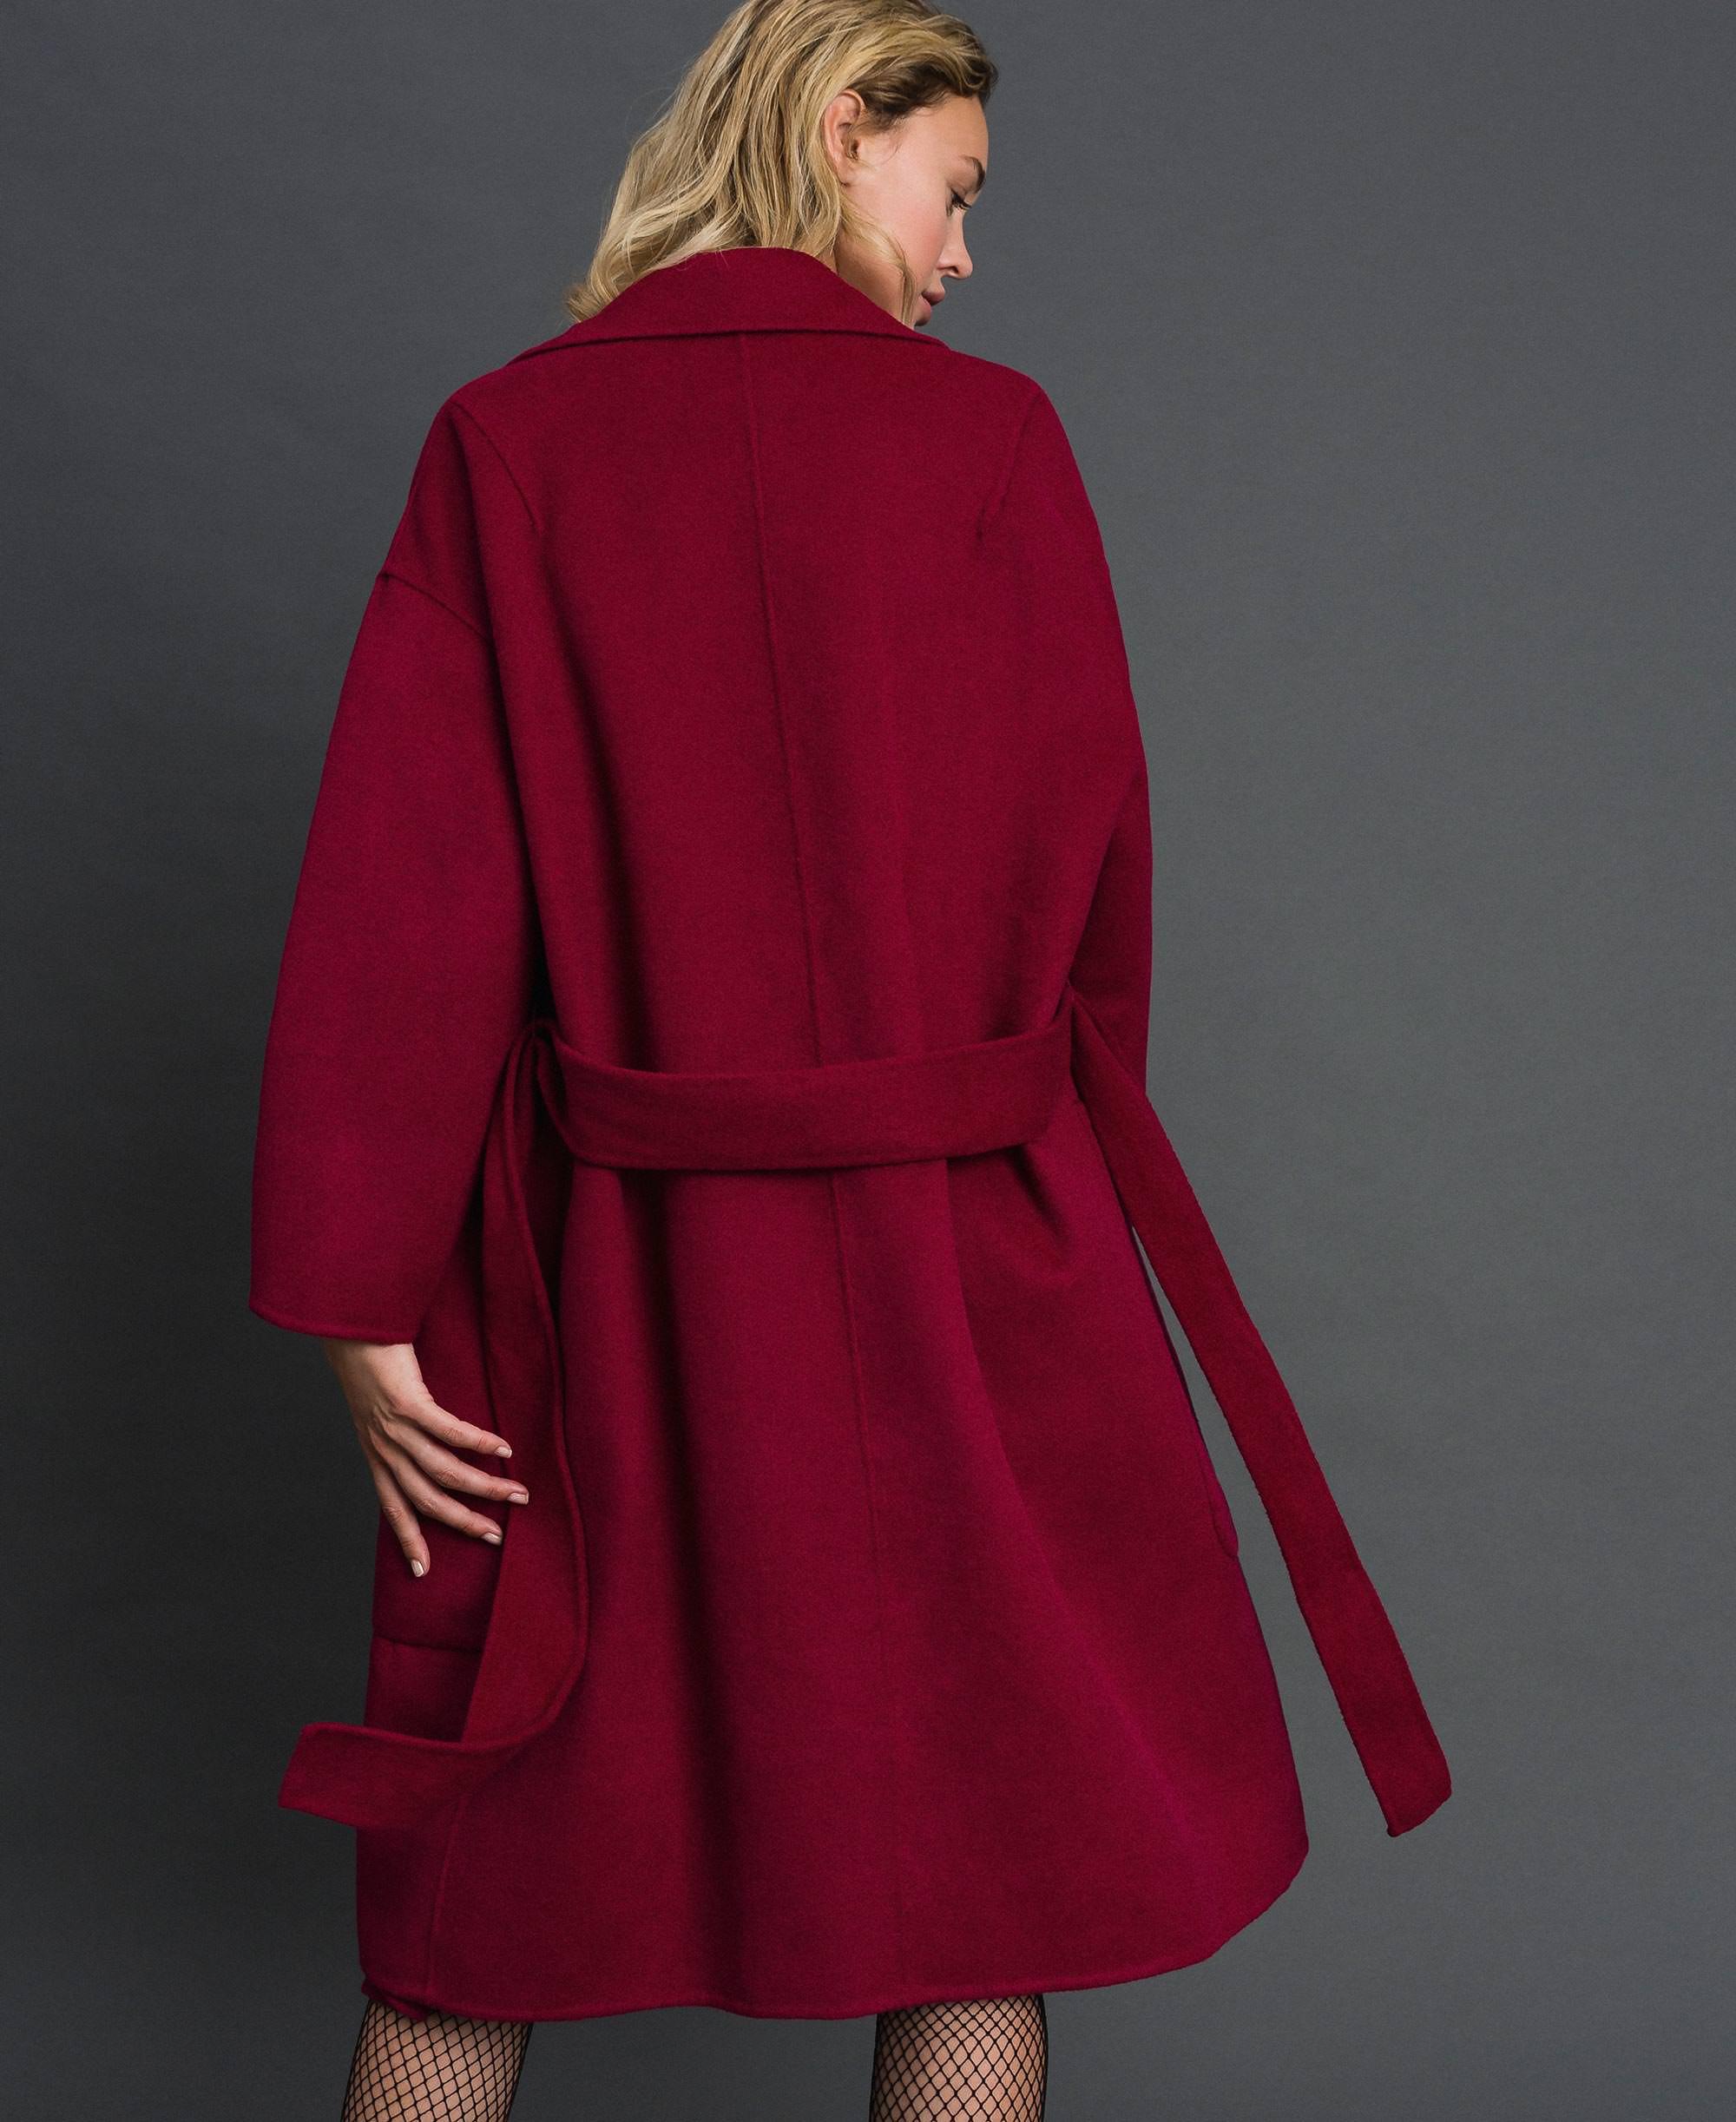 Wool Overs Womens Milano Lapel Collar Long Jacket